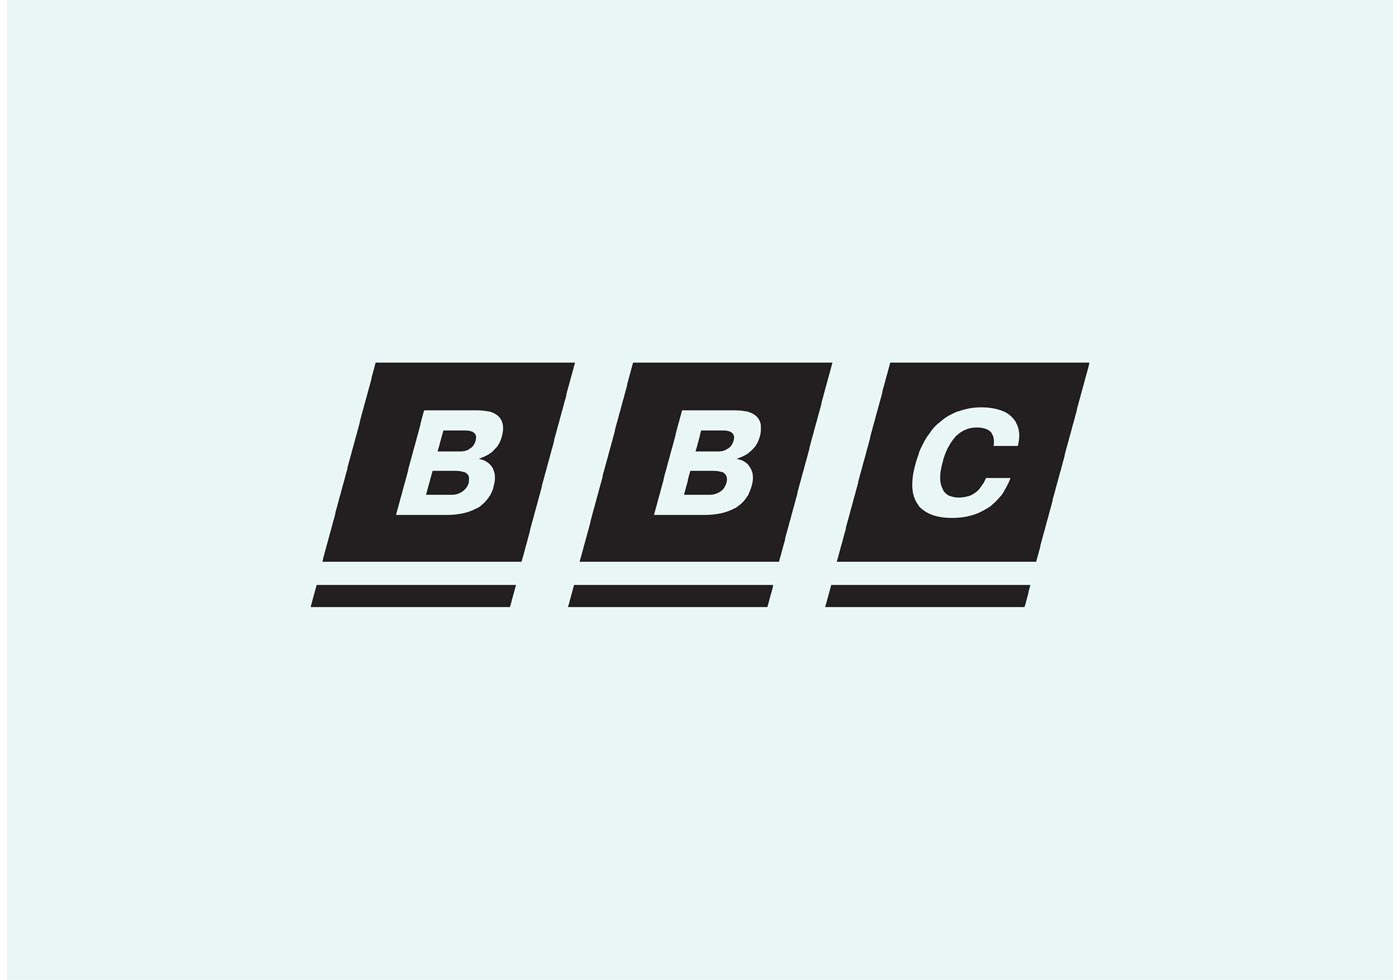 BBC Vector Logo - Download Free Vector Art, Stock Graphics ... Cbs News Logo Vector